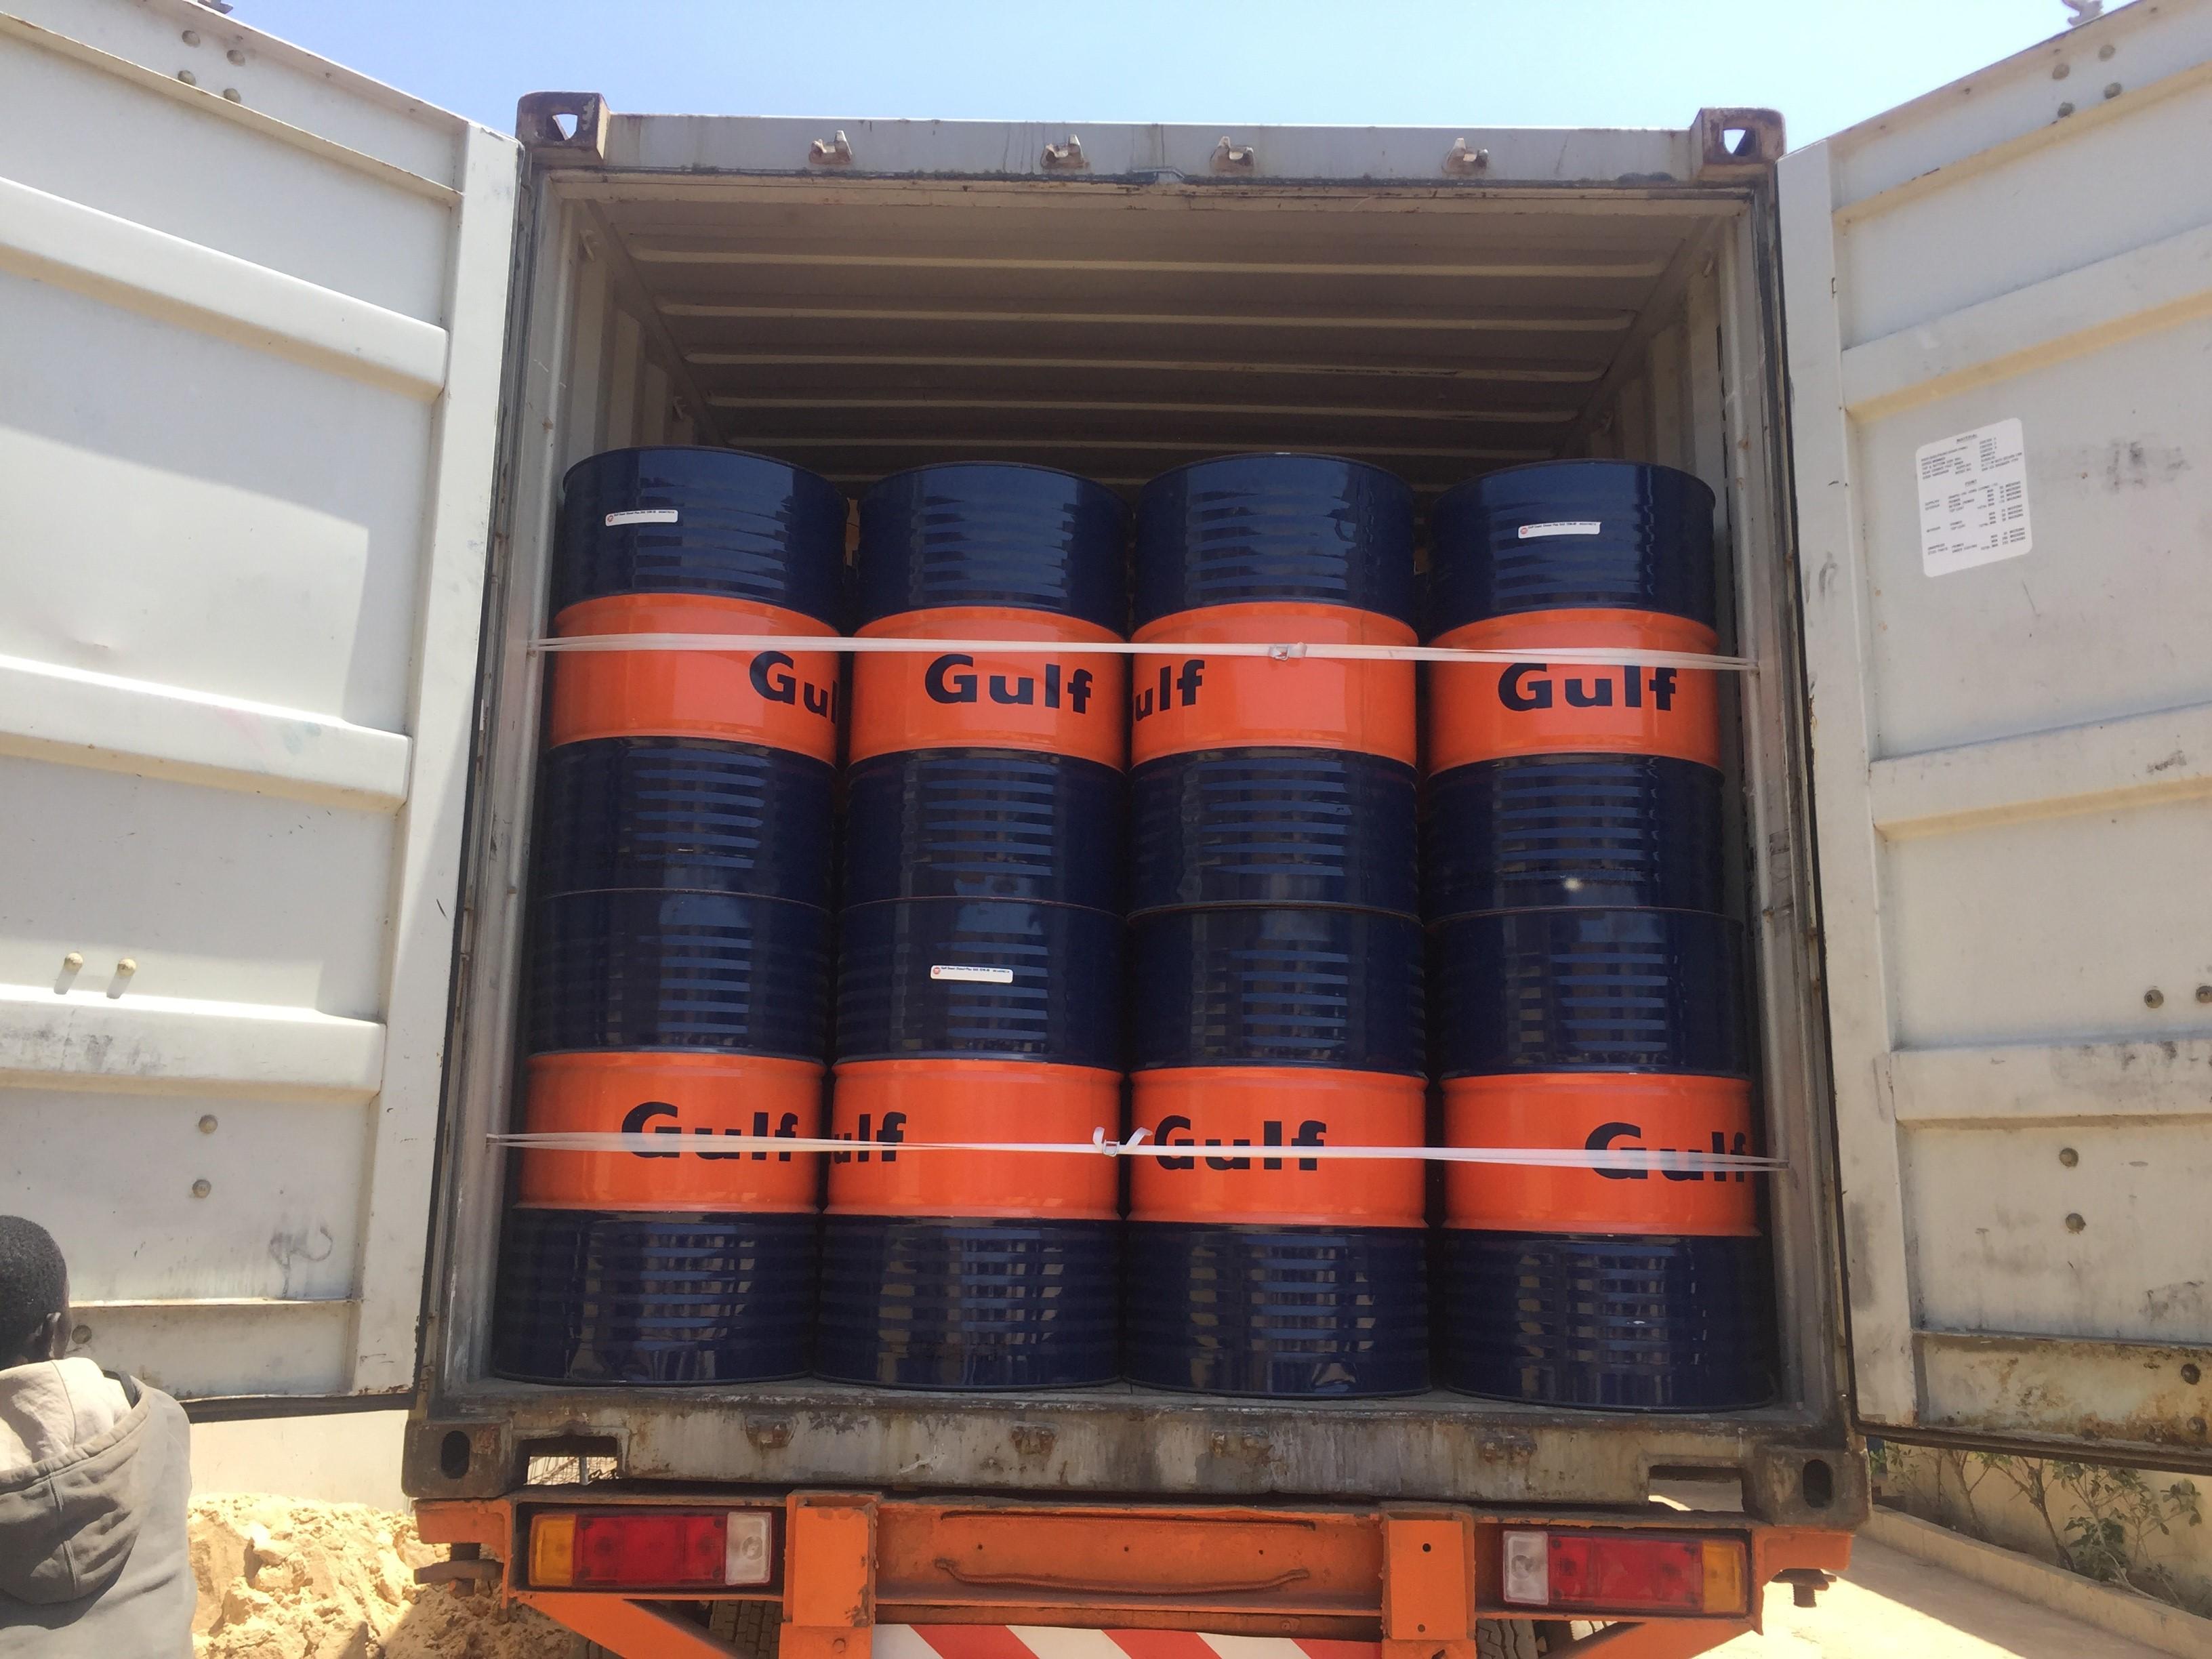 Gulf Oil Lubricants